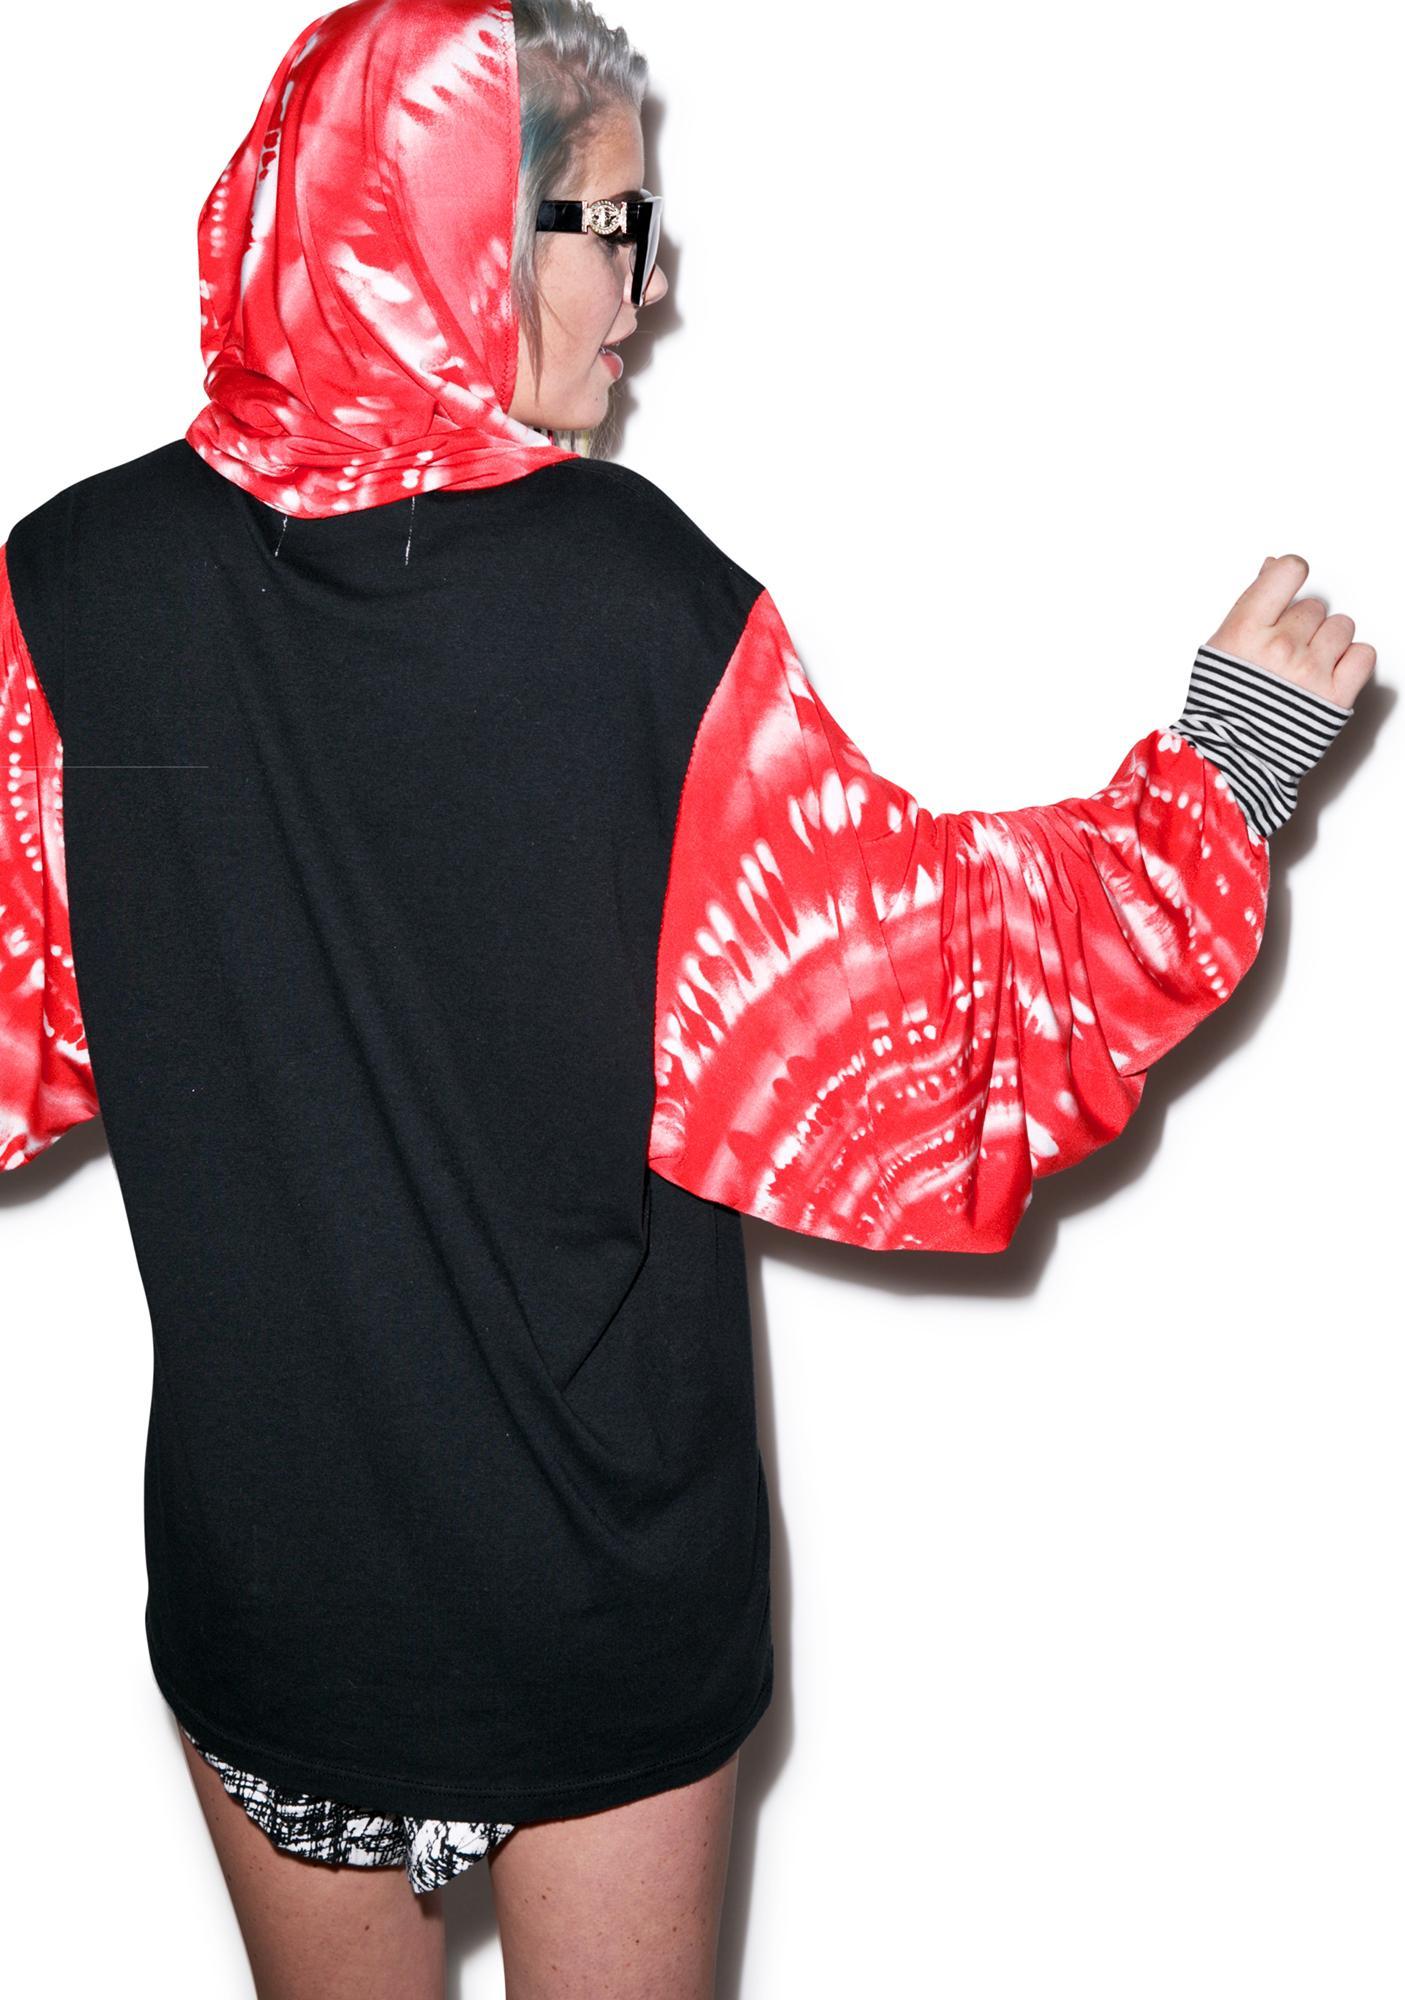 Mamadoux Lucky 7 Hooded Shirt